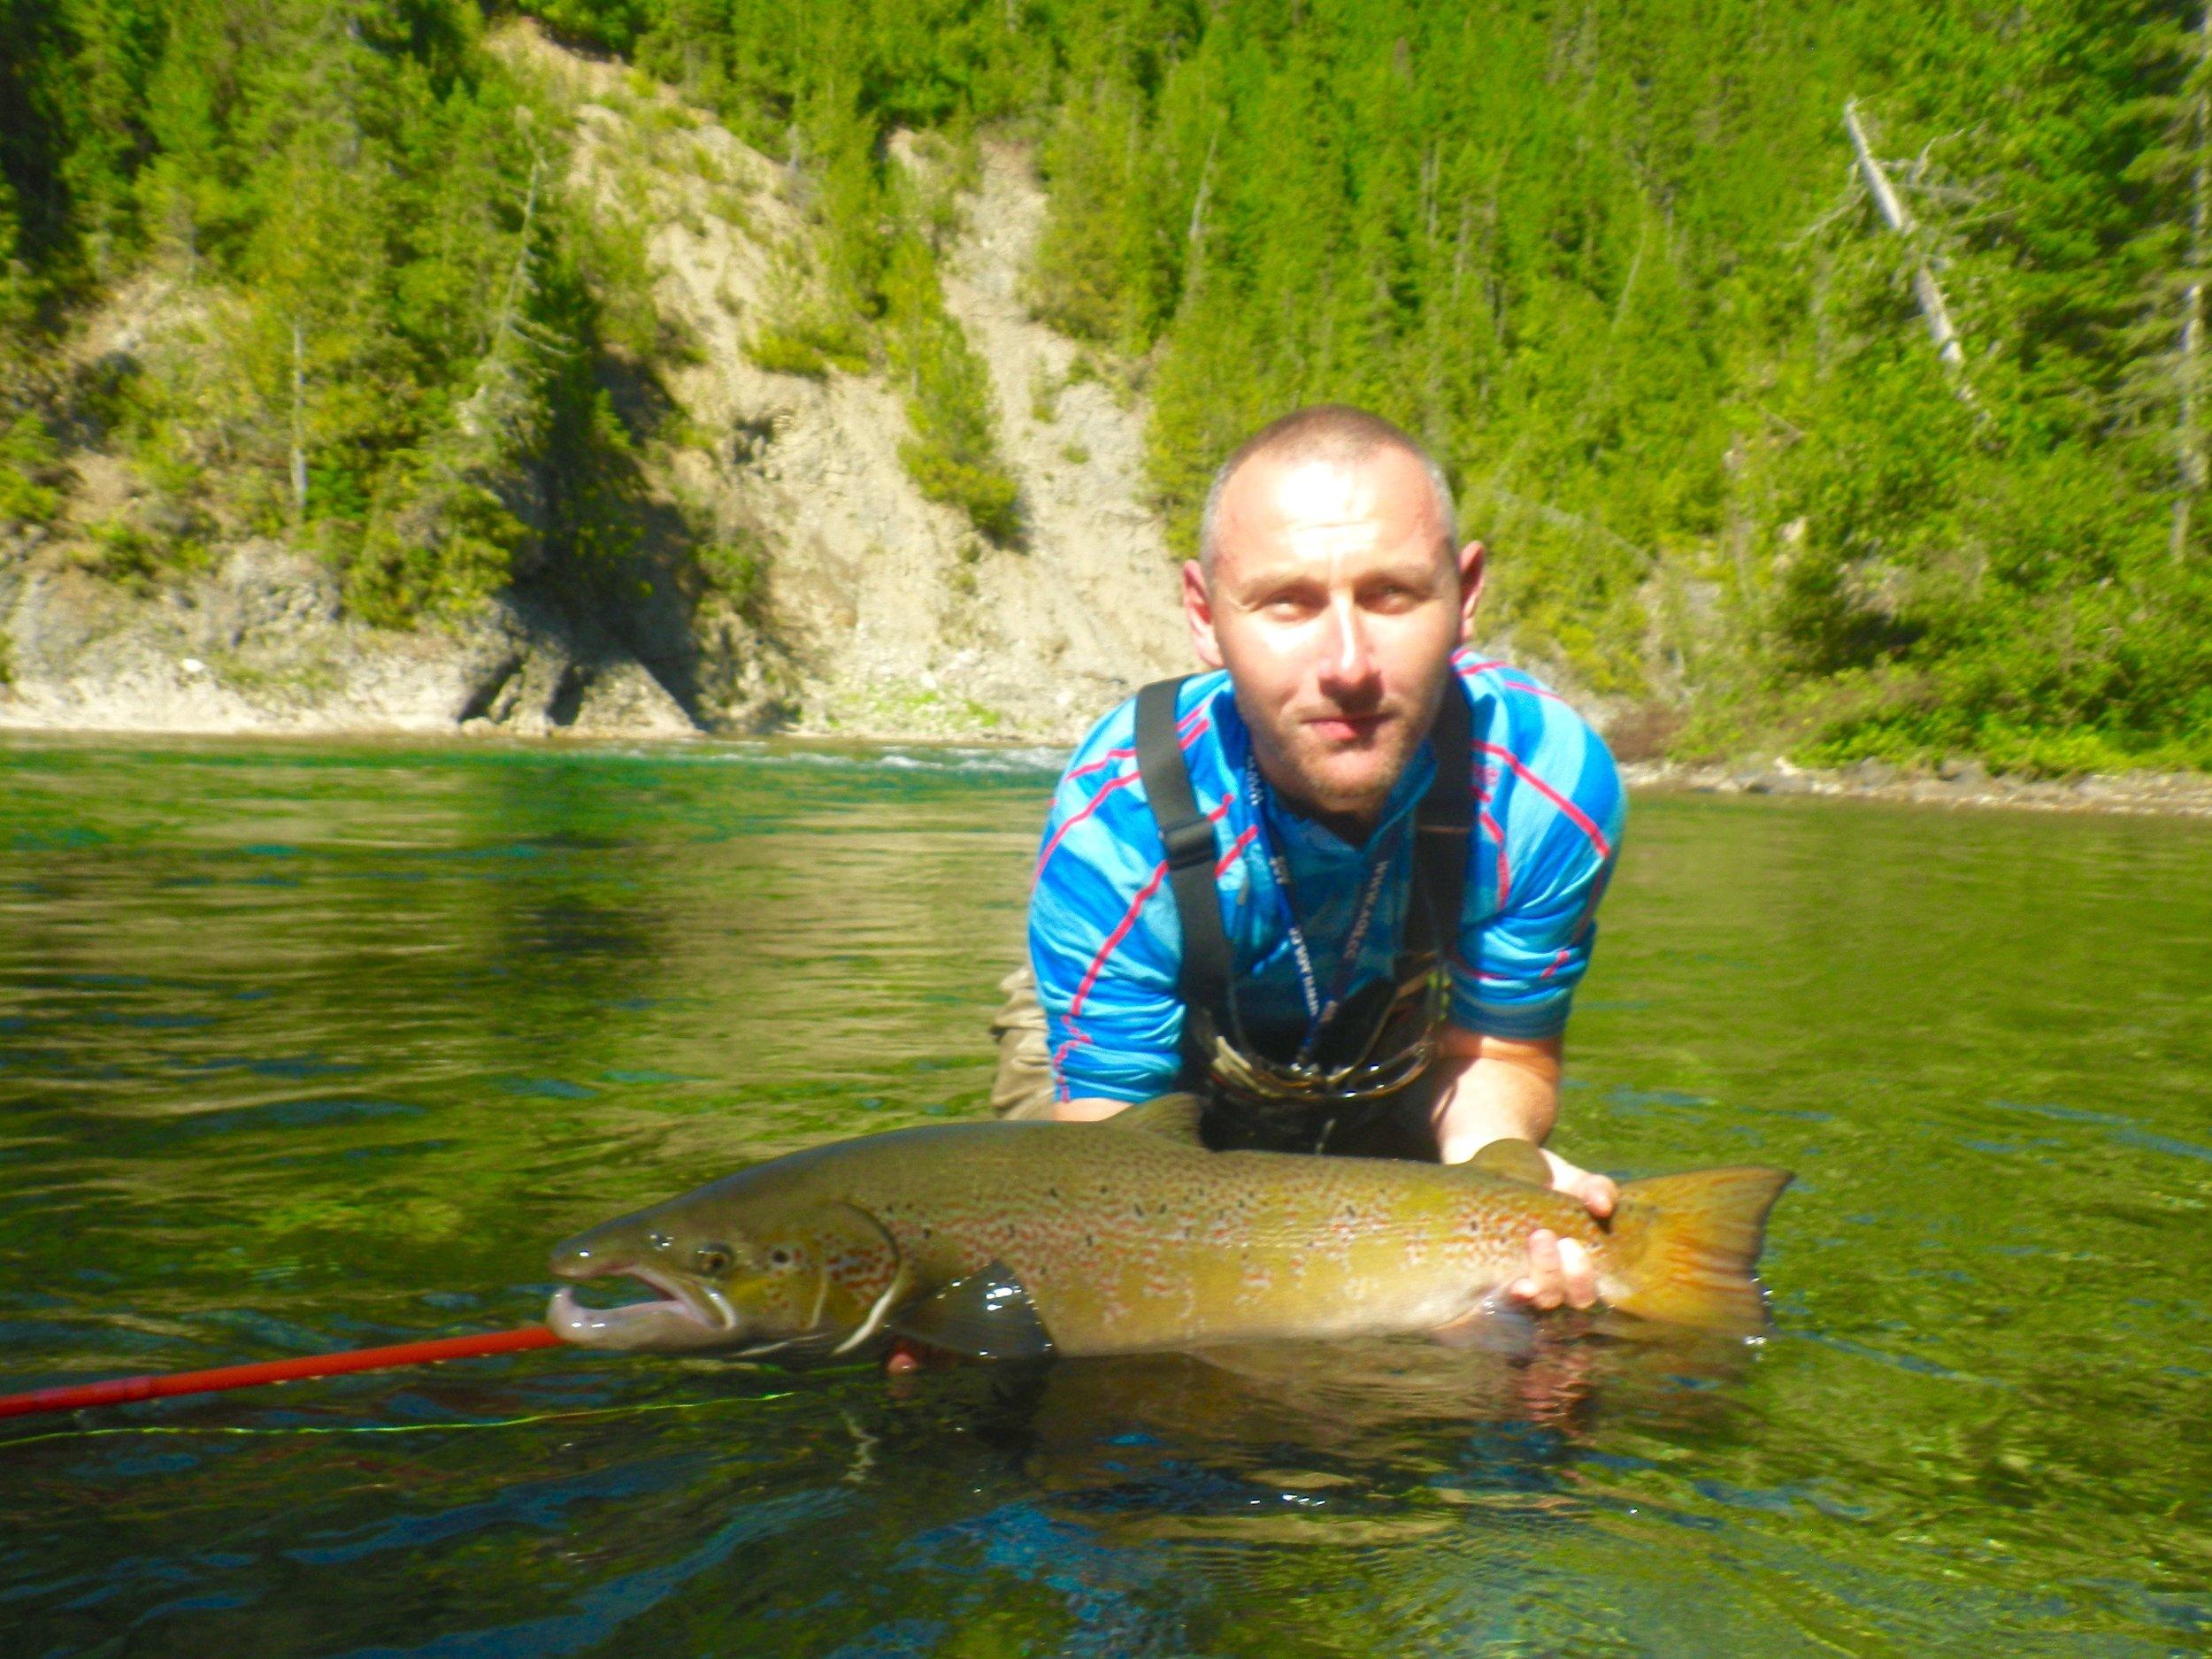 Klaus Vander with his first Canadian Atlantic salmon, congratulations Klaus!